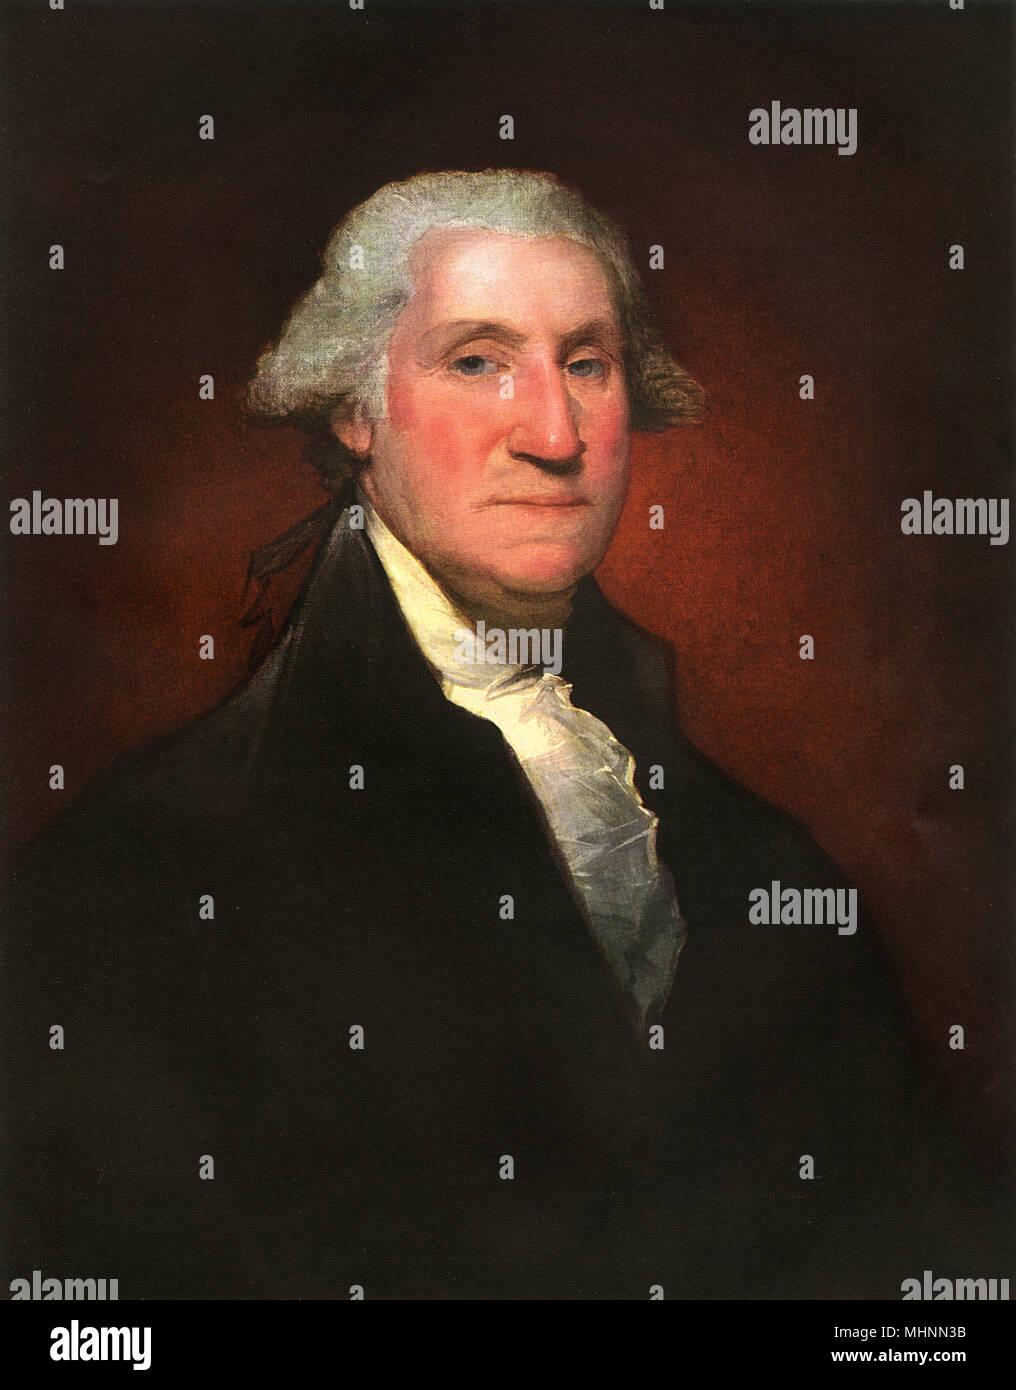 George Washington (1732-1799), da Gilbert Stuart (1755-1828) - pittura a olio su tela. Data: 1795 Immagini Stock